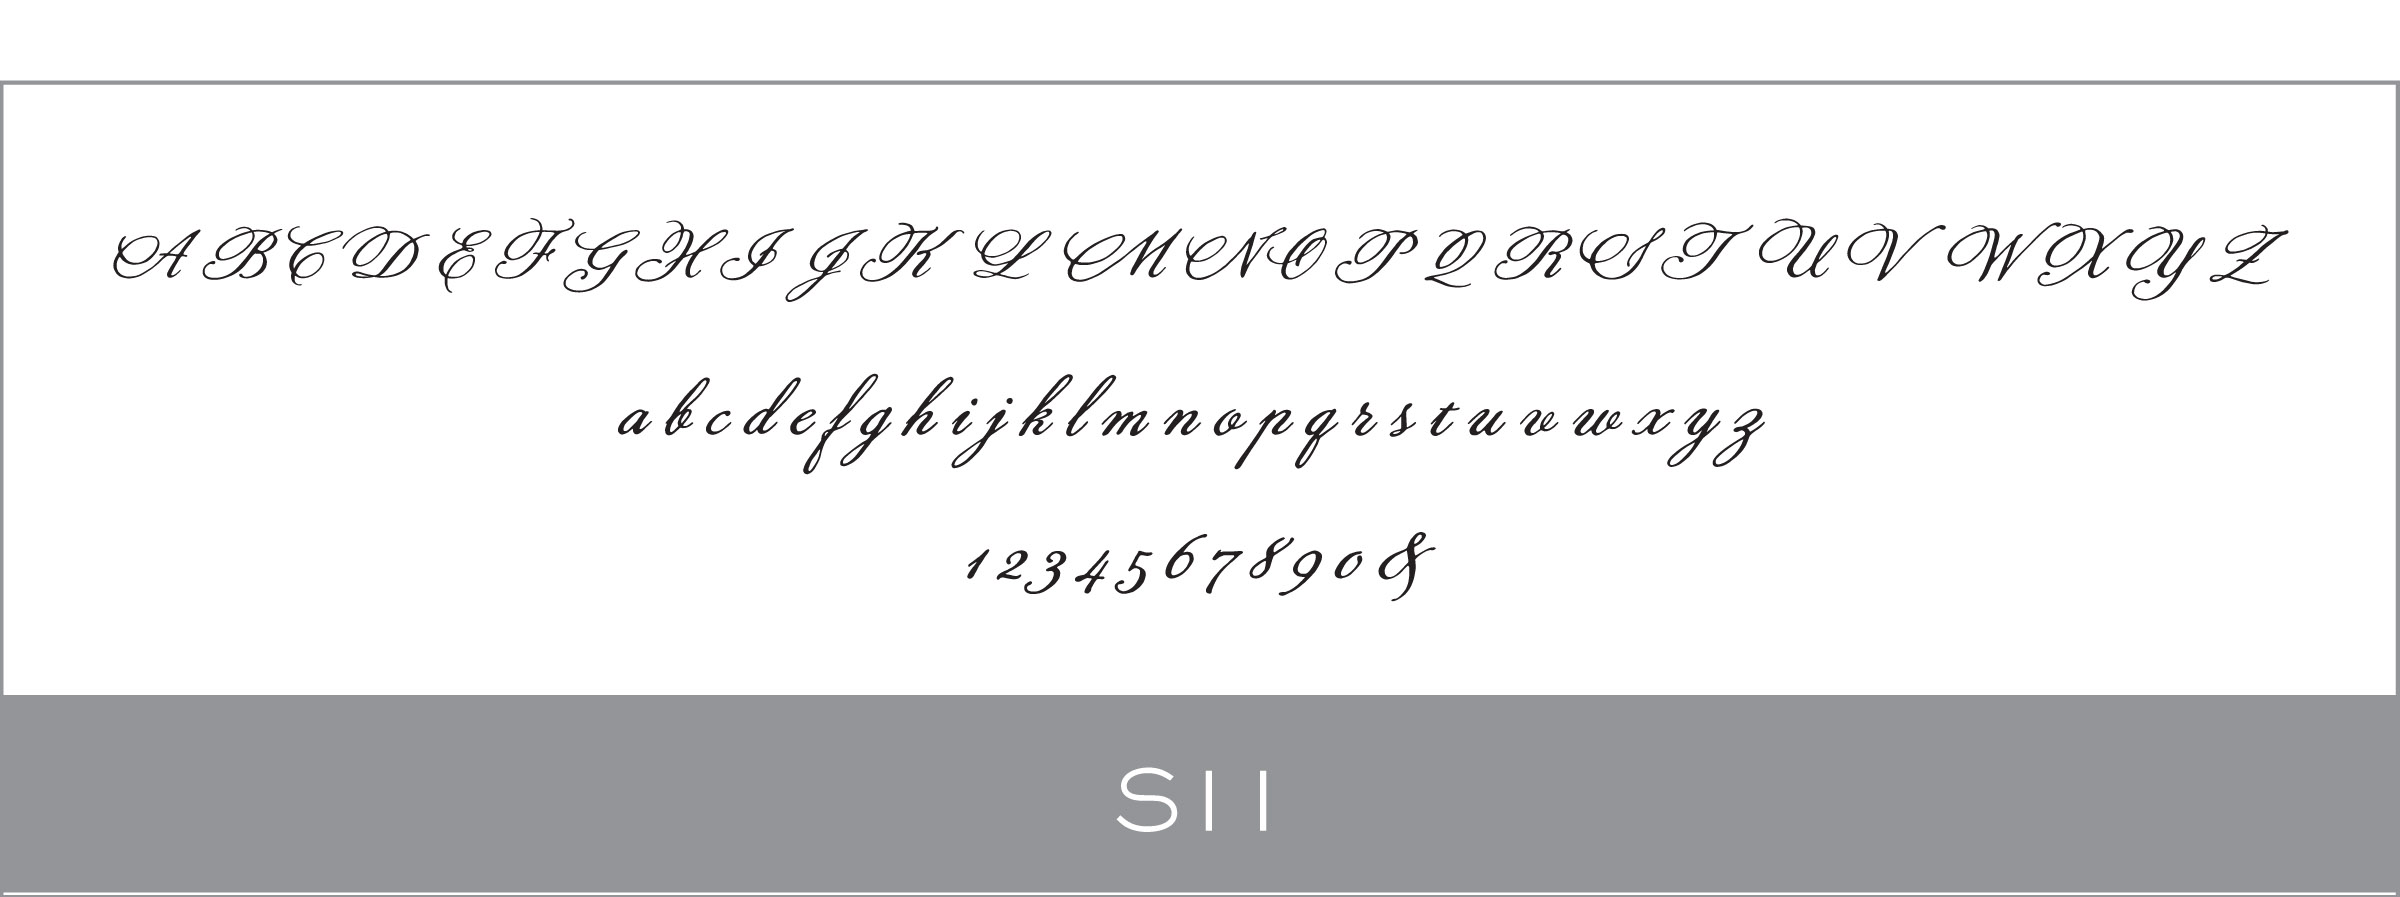 S11_Haute_Papier_Font.jpg